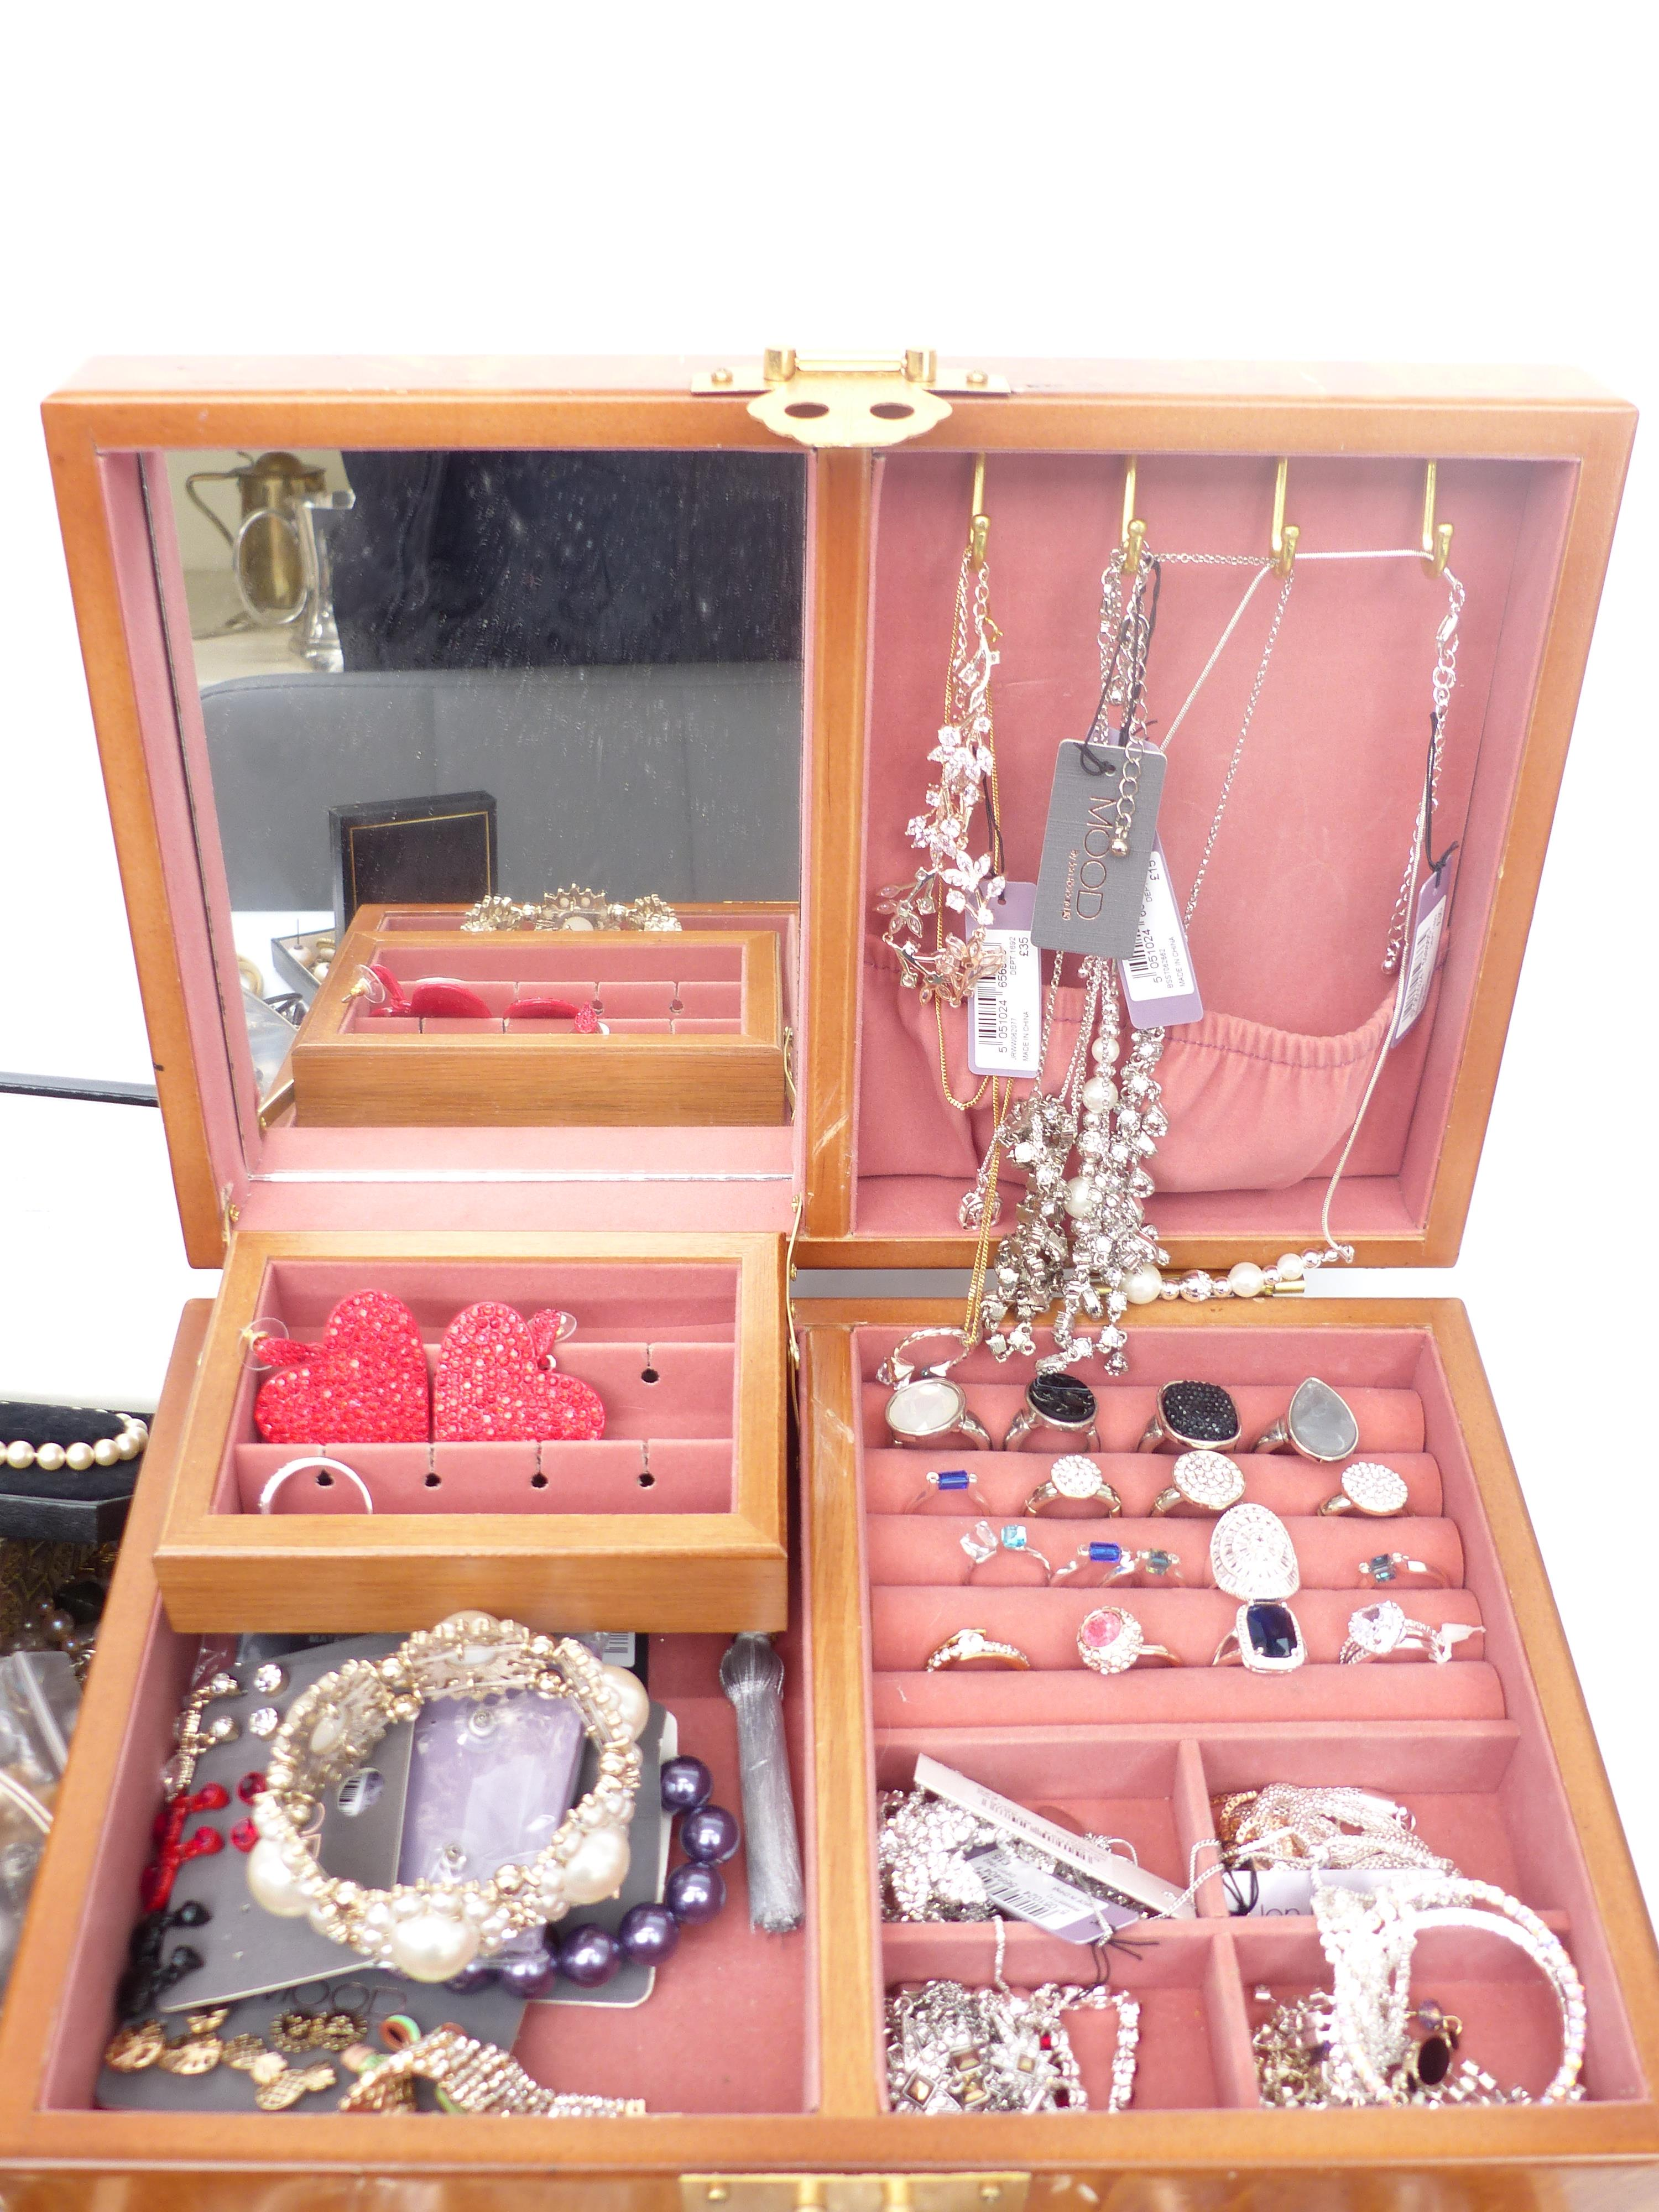 A collection of costume jewellery including cameo brooch, diamanté, rose quartz necklace, etc - Image 2 of 4